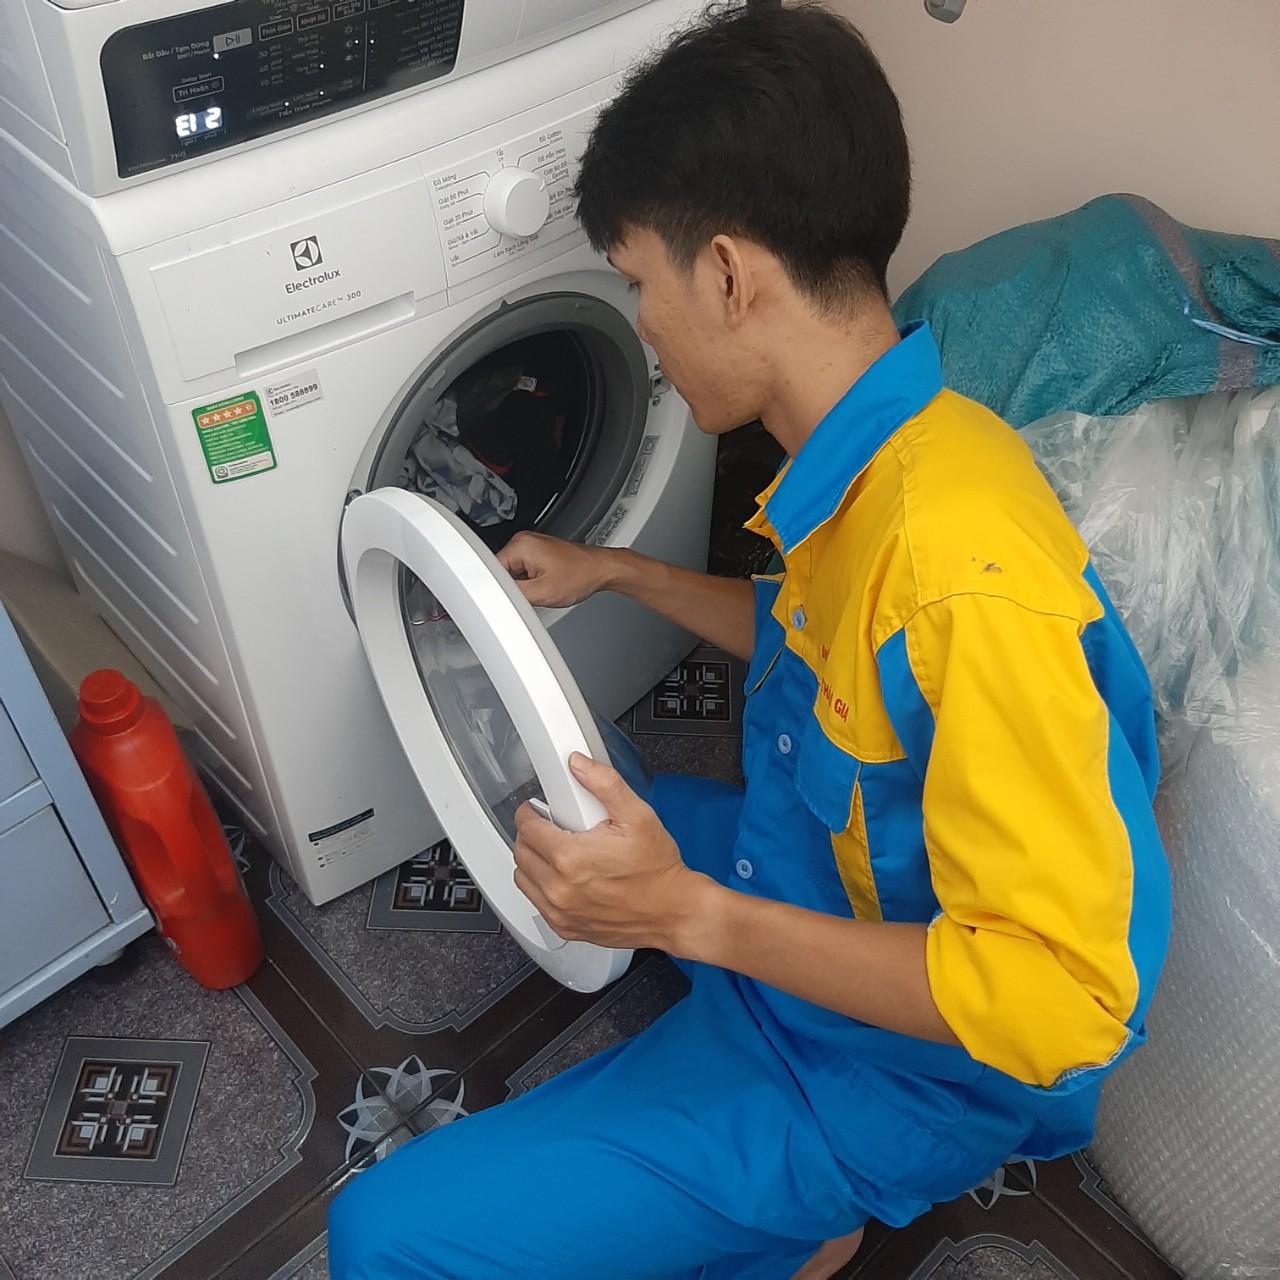 sửa máy giặt electrolux uy tín